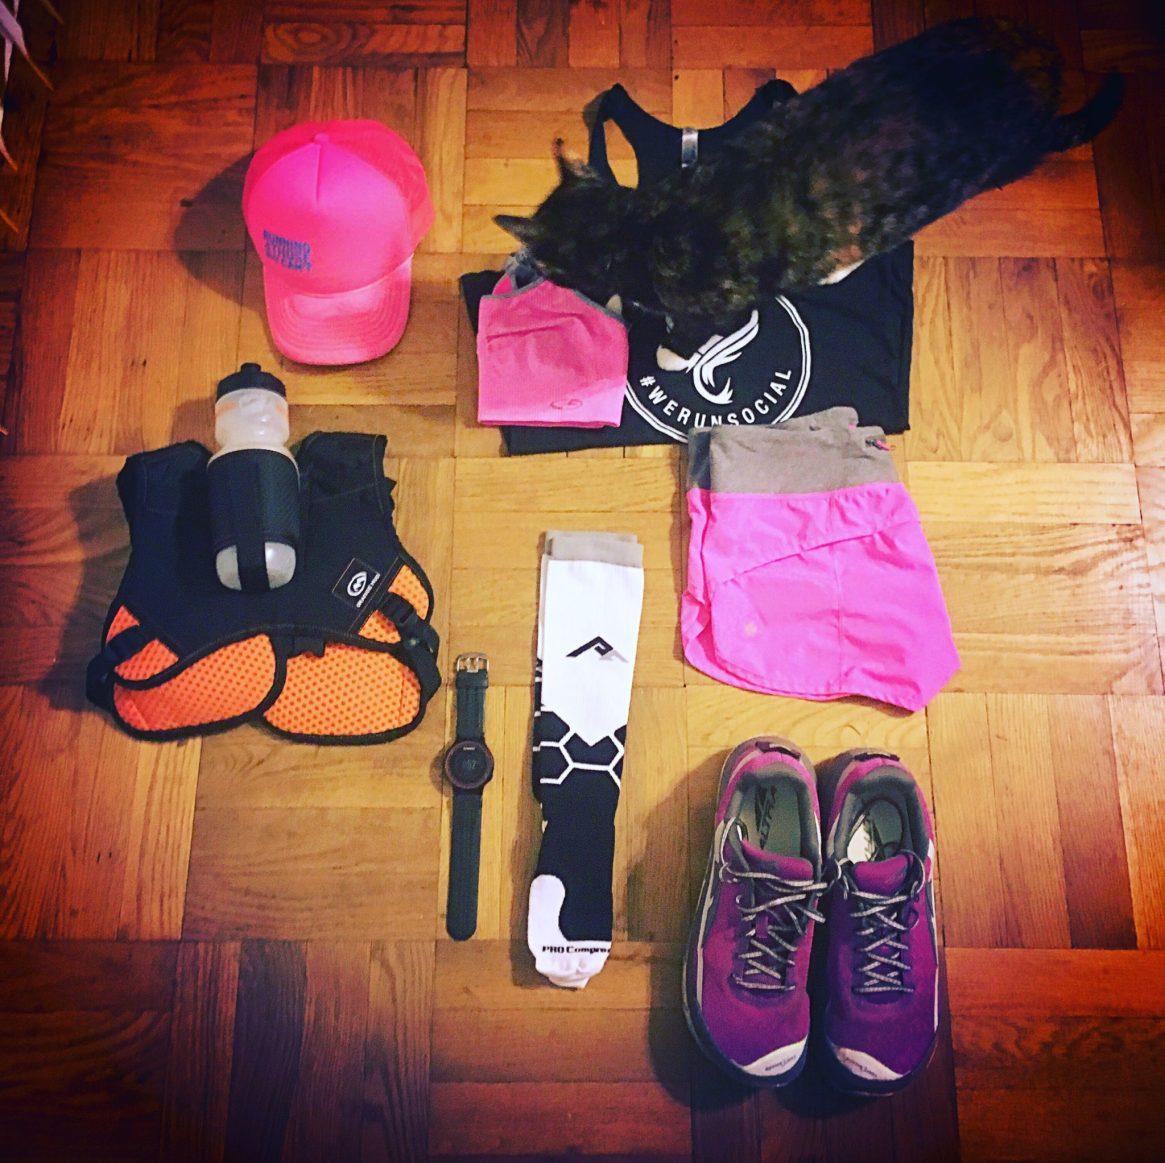 SD 50, trail marathon, flat jenny, altra running,orange mud, we run social, procompression, lululemon